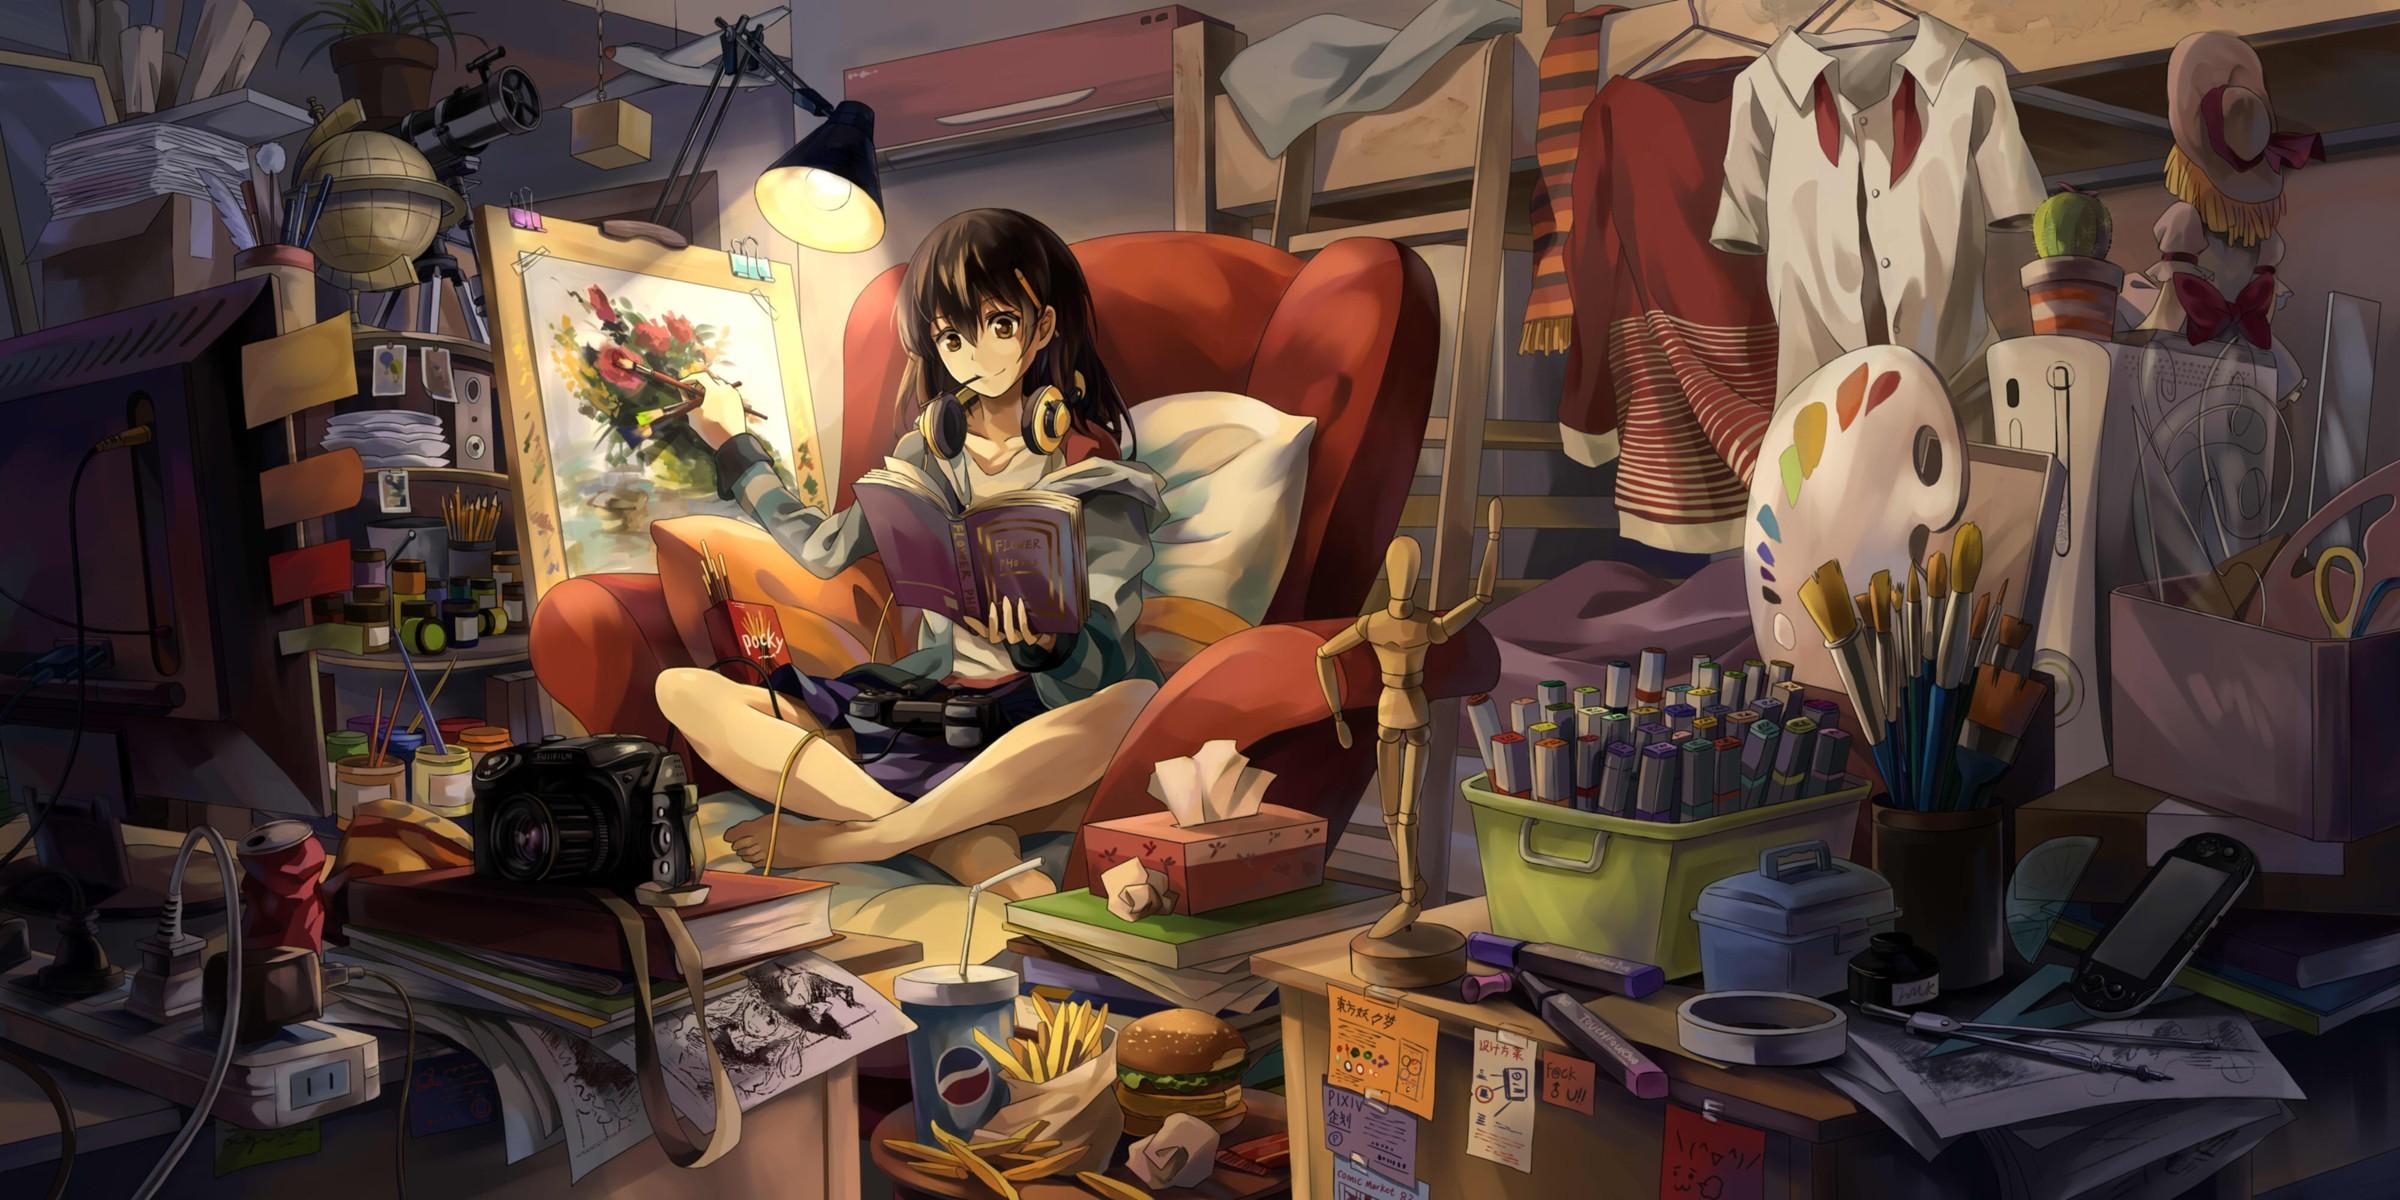 Anime 2400x1200 painting anime girls room original characters anime interior books artwork casual clutter NEKO (Yanshoujie)